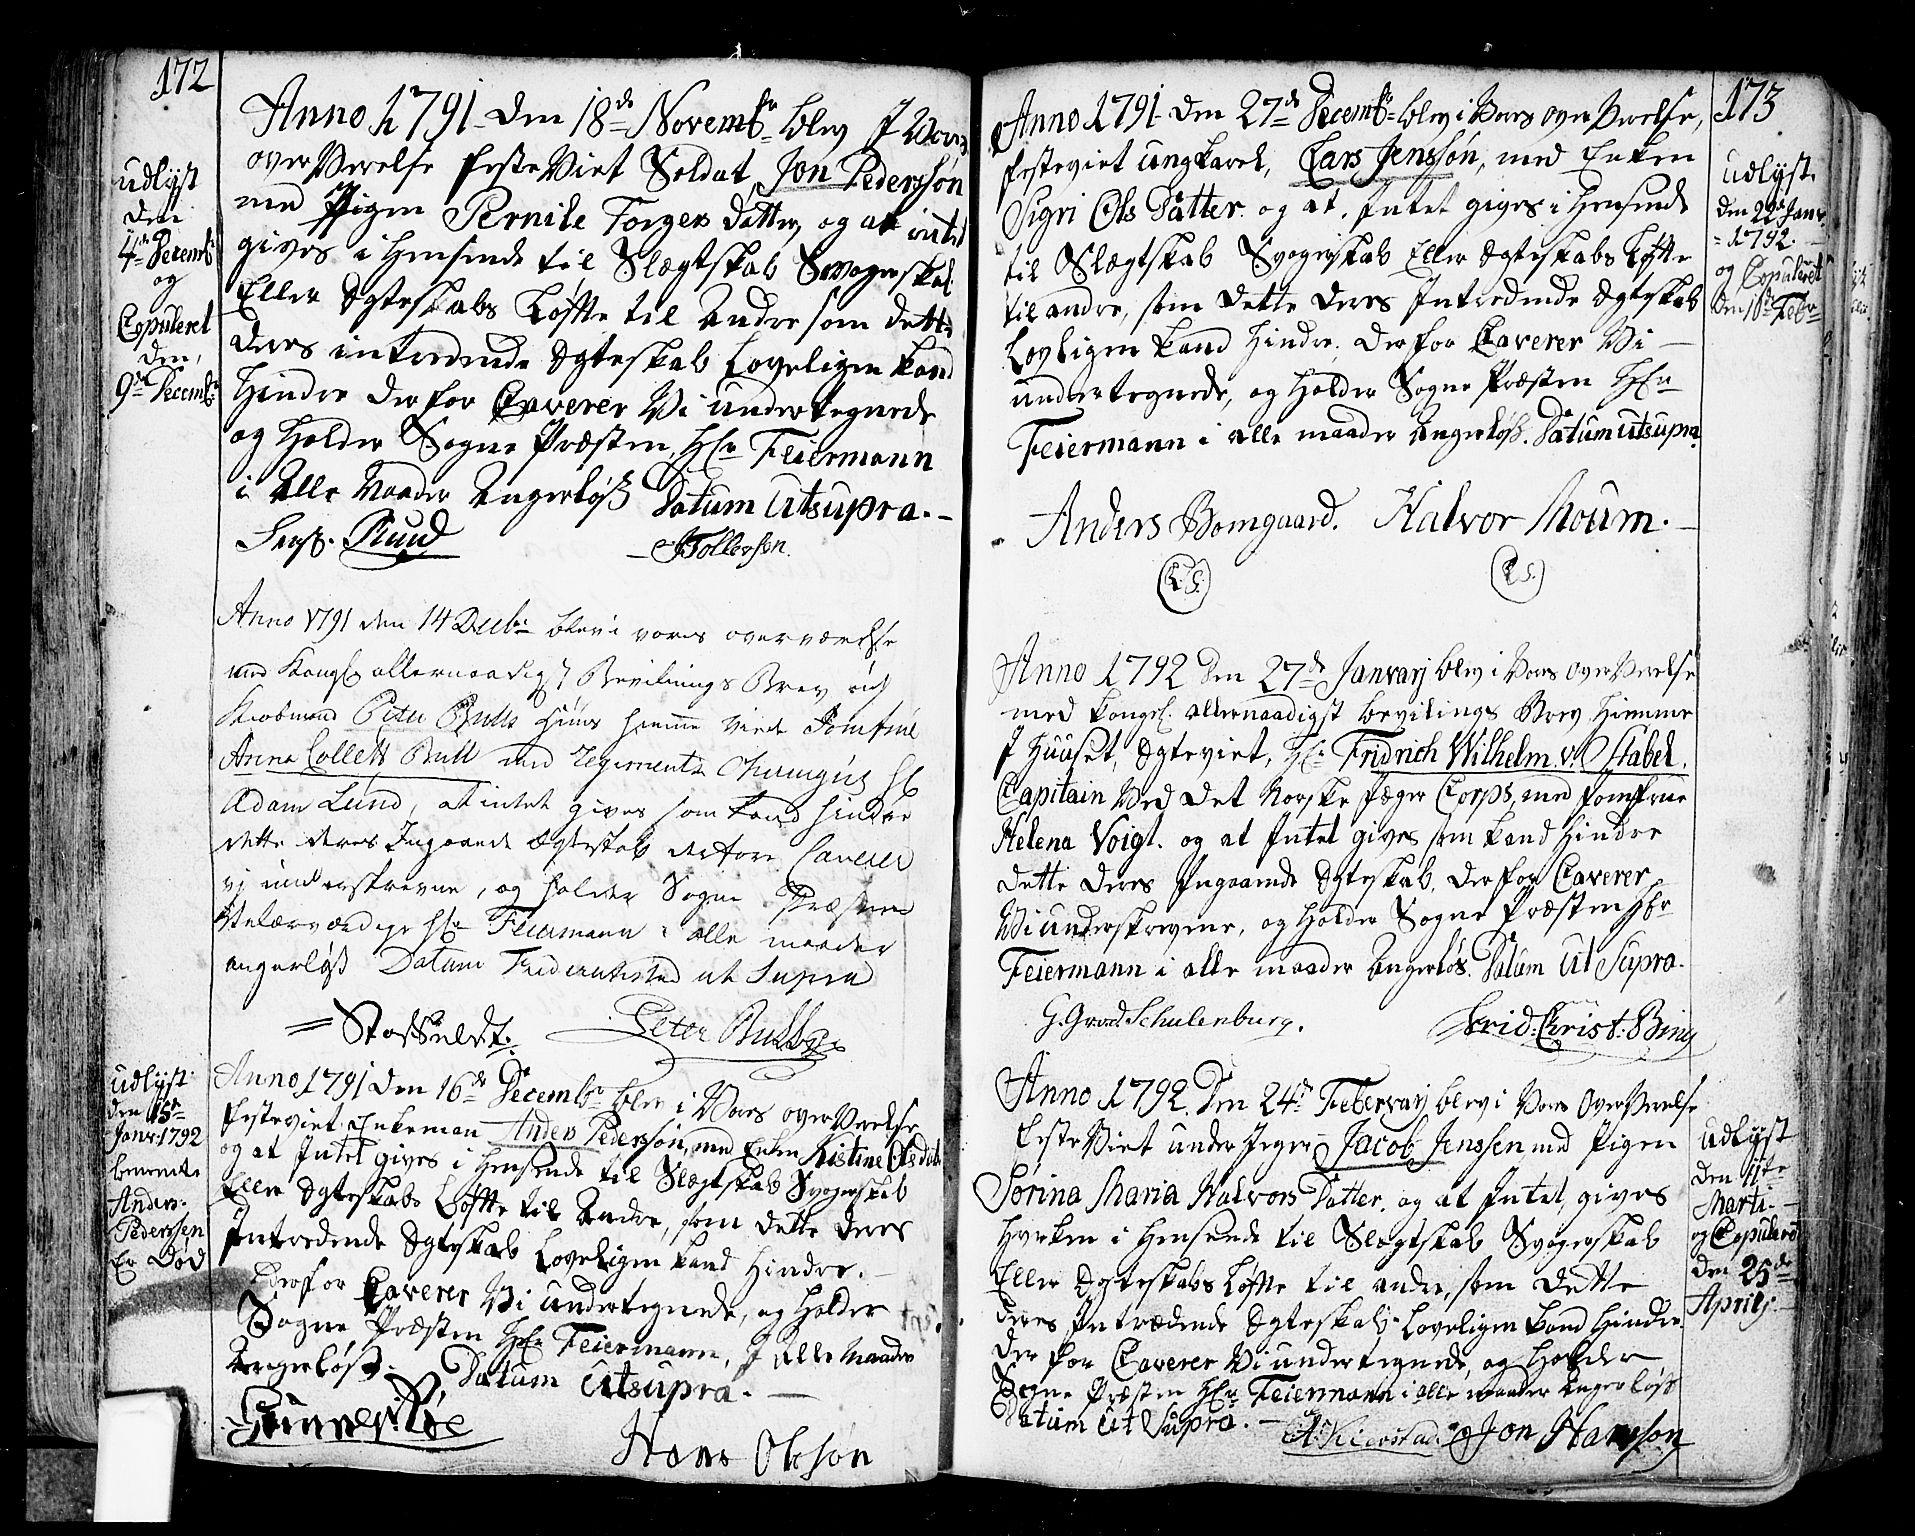 SAO, Fredrikstad prestekontor Kirkebøker, F/Fa/L0002: Ministerialbok nr. 2, 1750-1804, s. 172-173